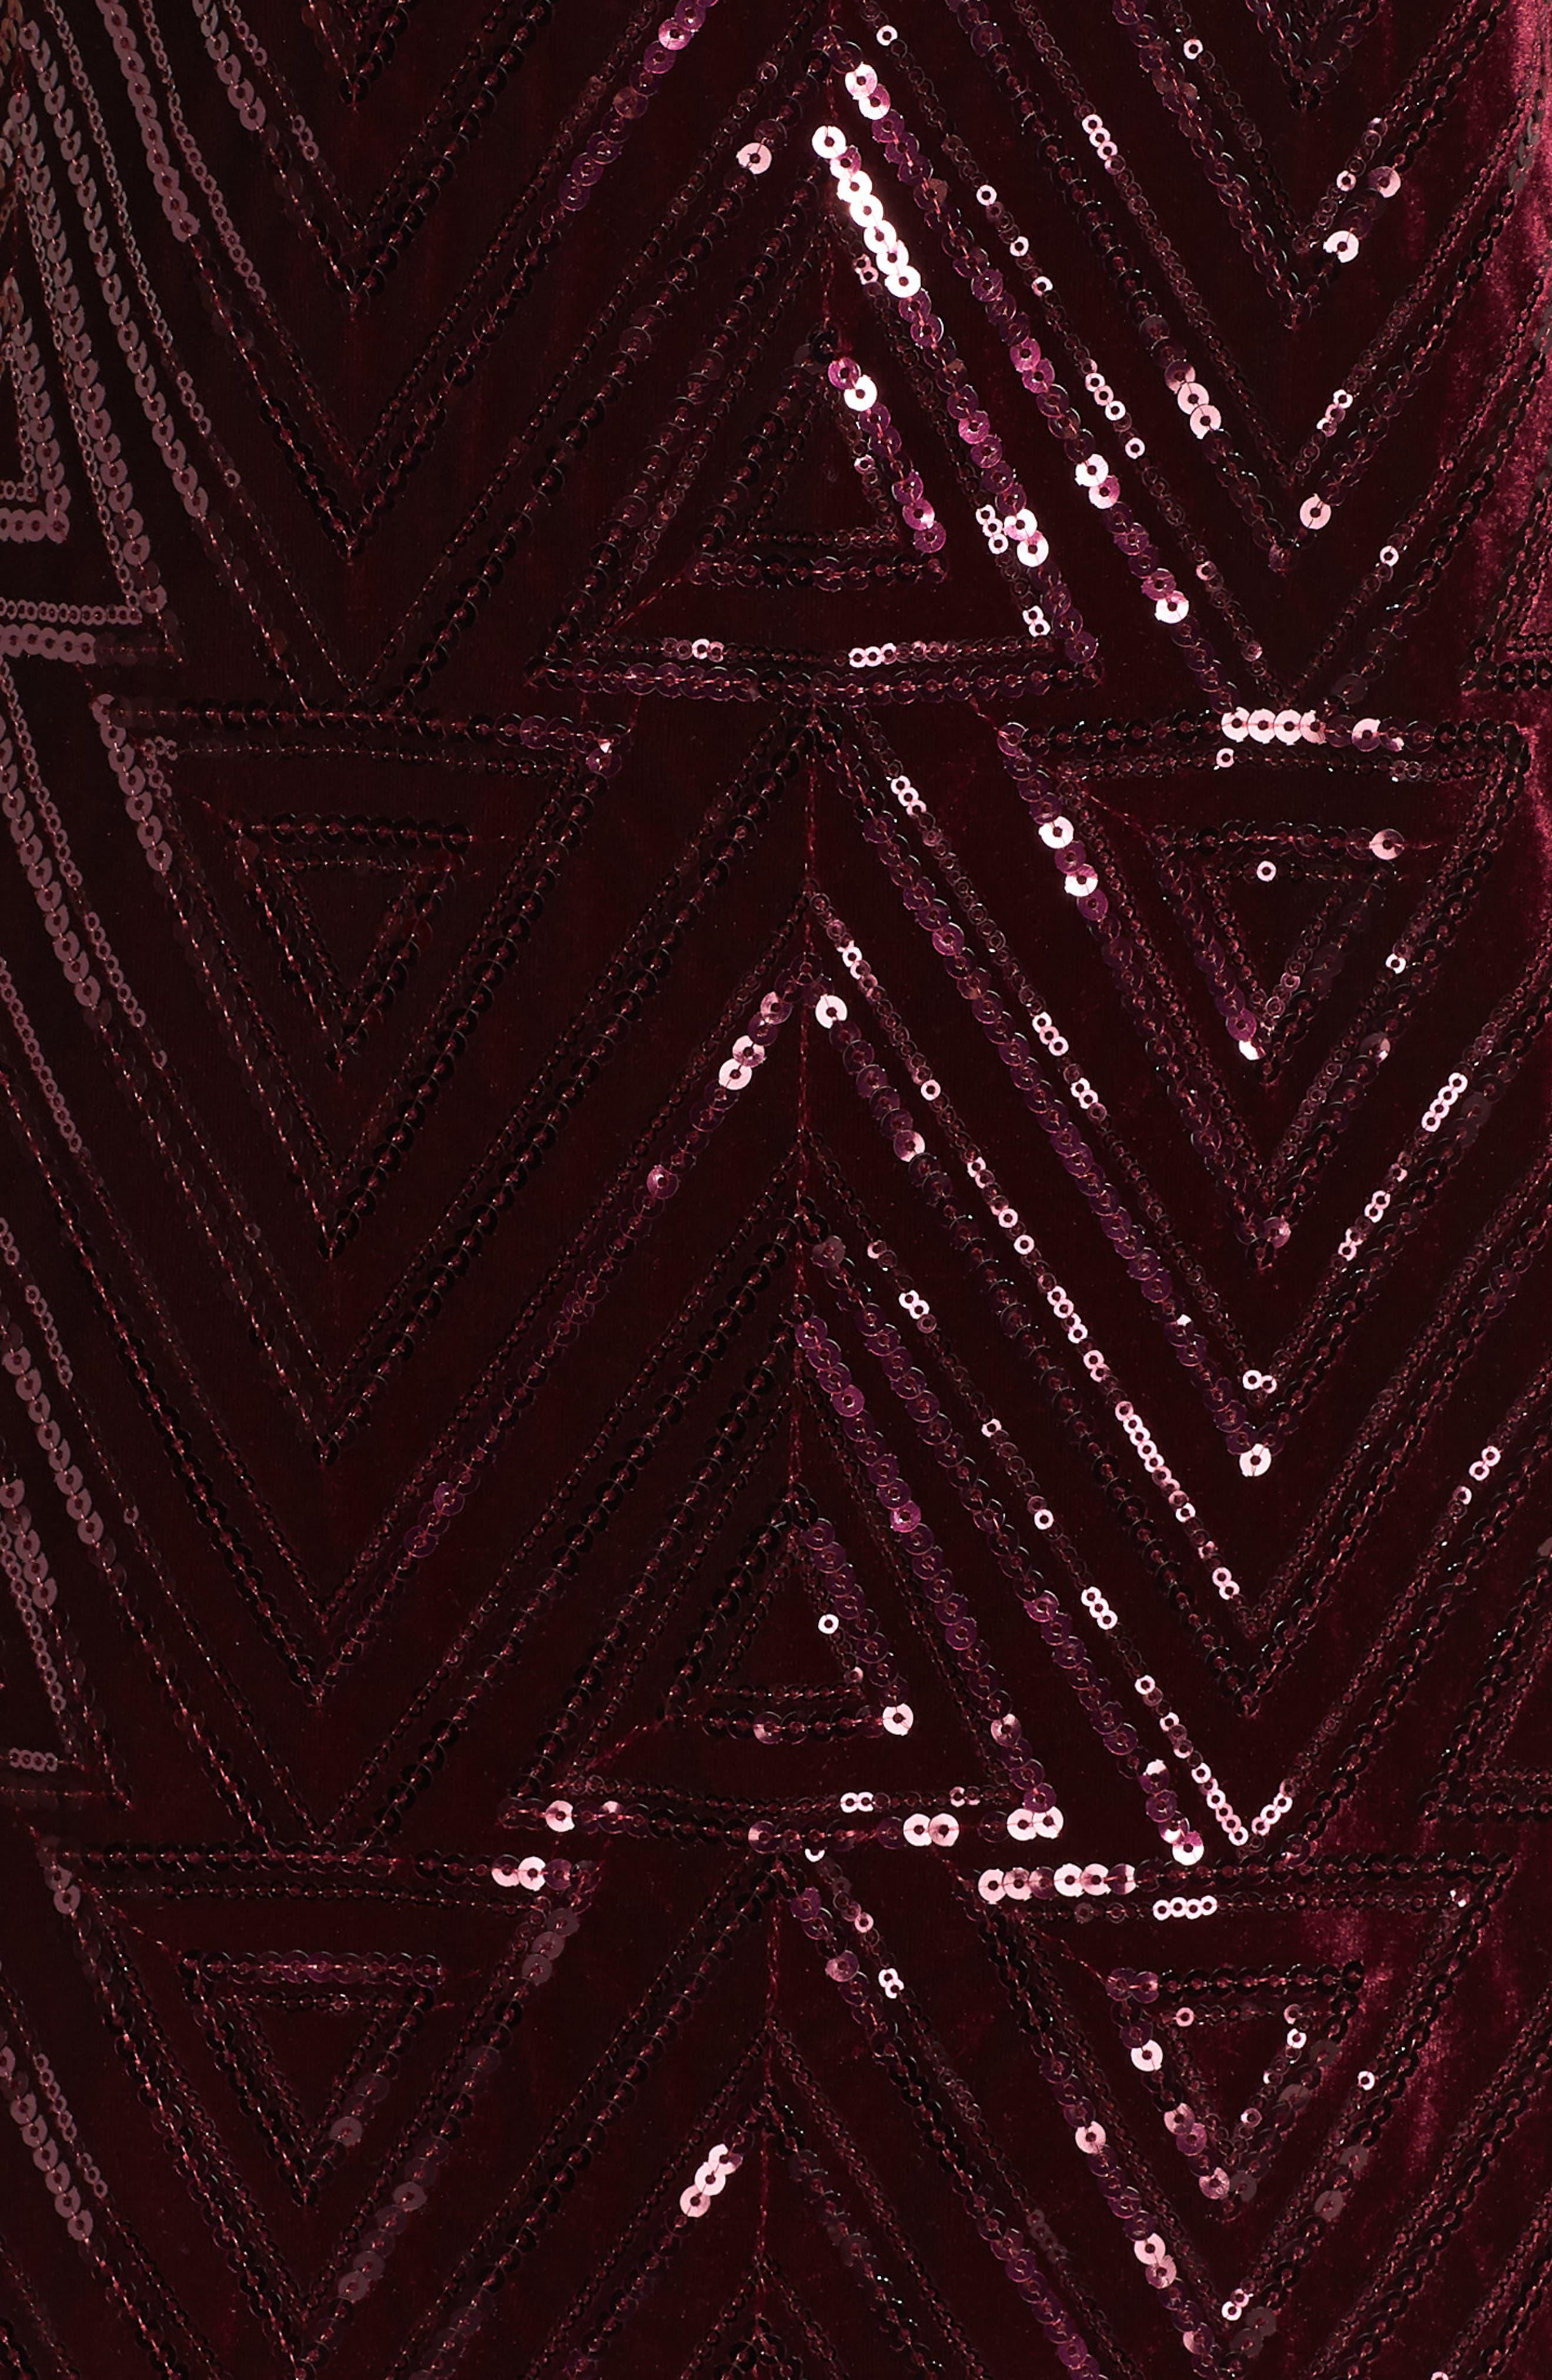 Sequin Sheath Dress,                             Alternate thumbnail 6, color,                             MAROON